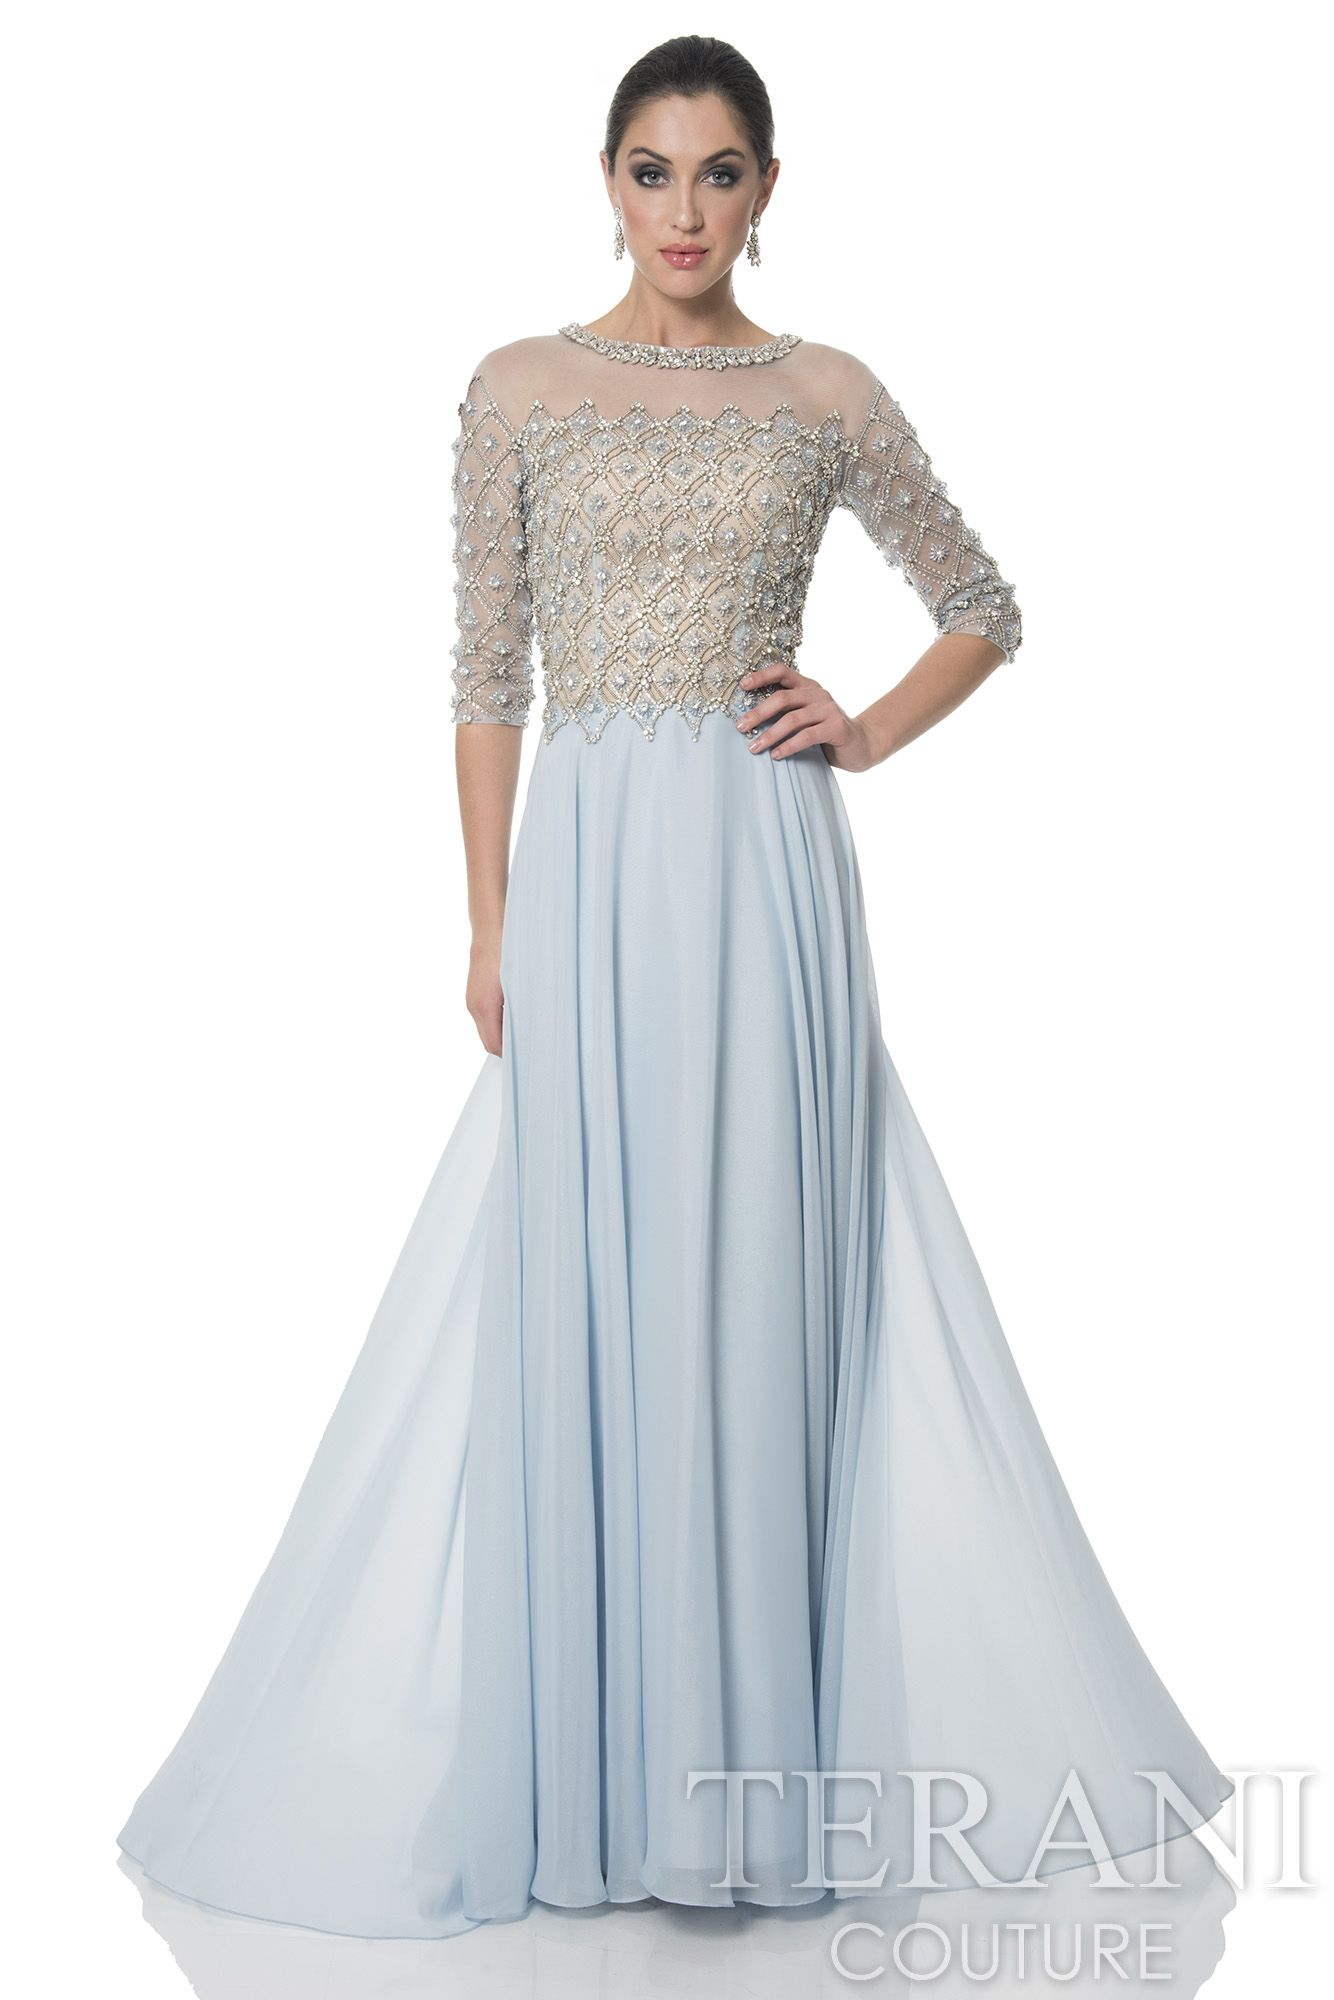 Dorable Wedding Gowns Under 300 Inspiration - All Wedding Dresses ...